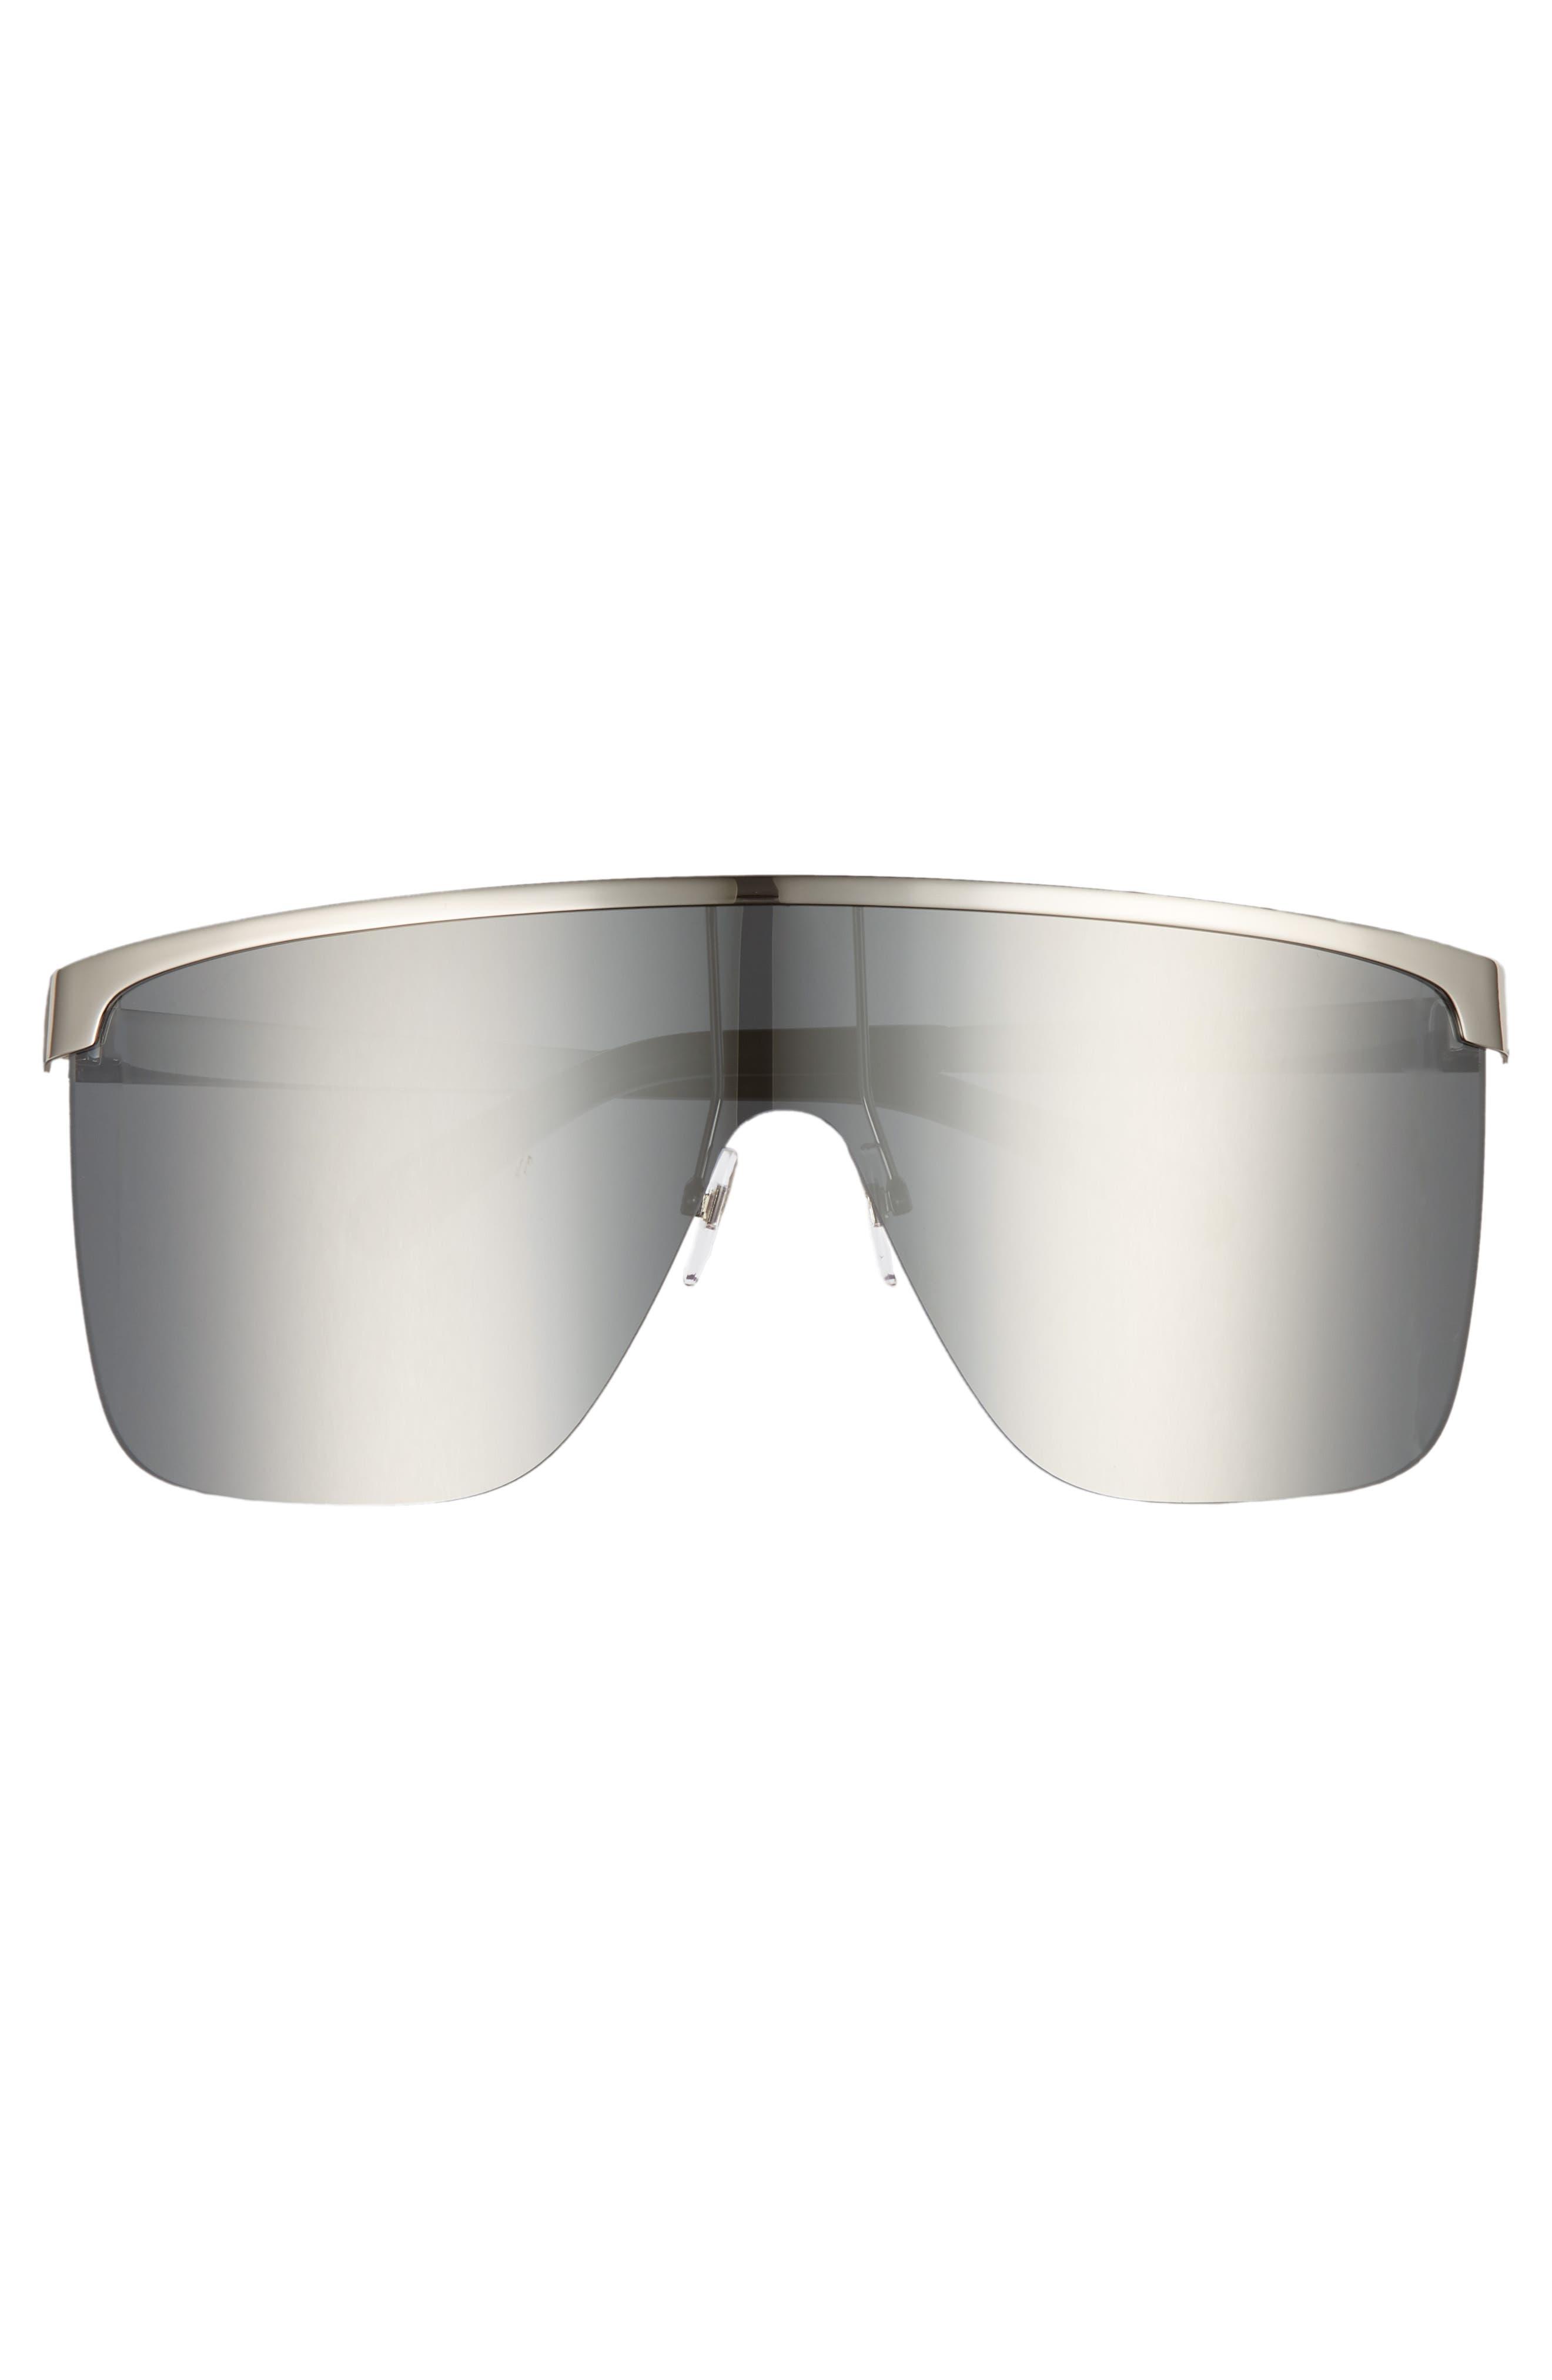 70mm Rimless Shield Sunglasses,                             Alternate thumbnail 3, color,                             PALLADIUM